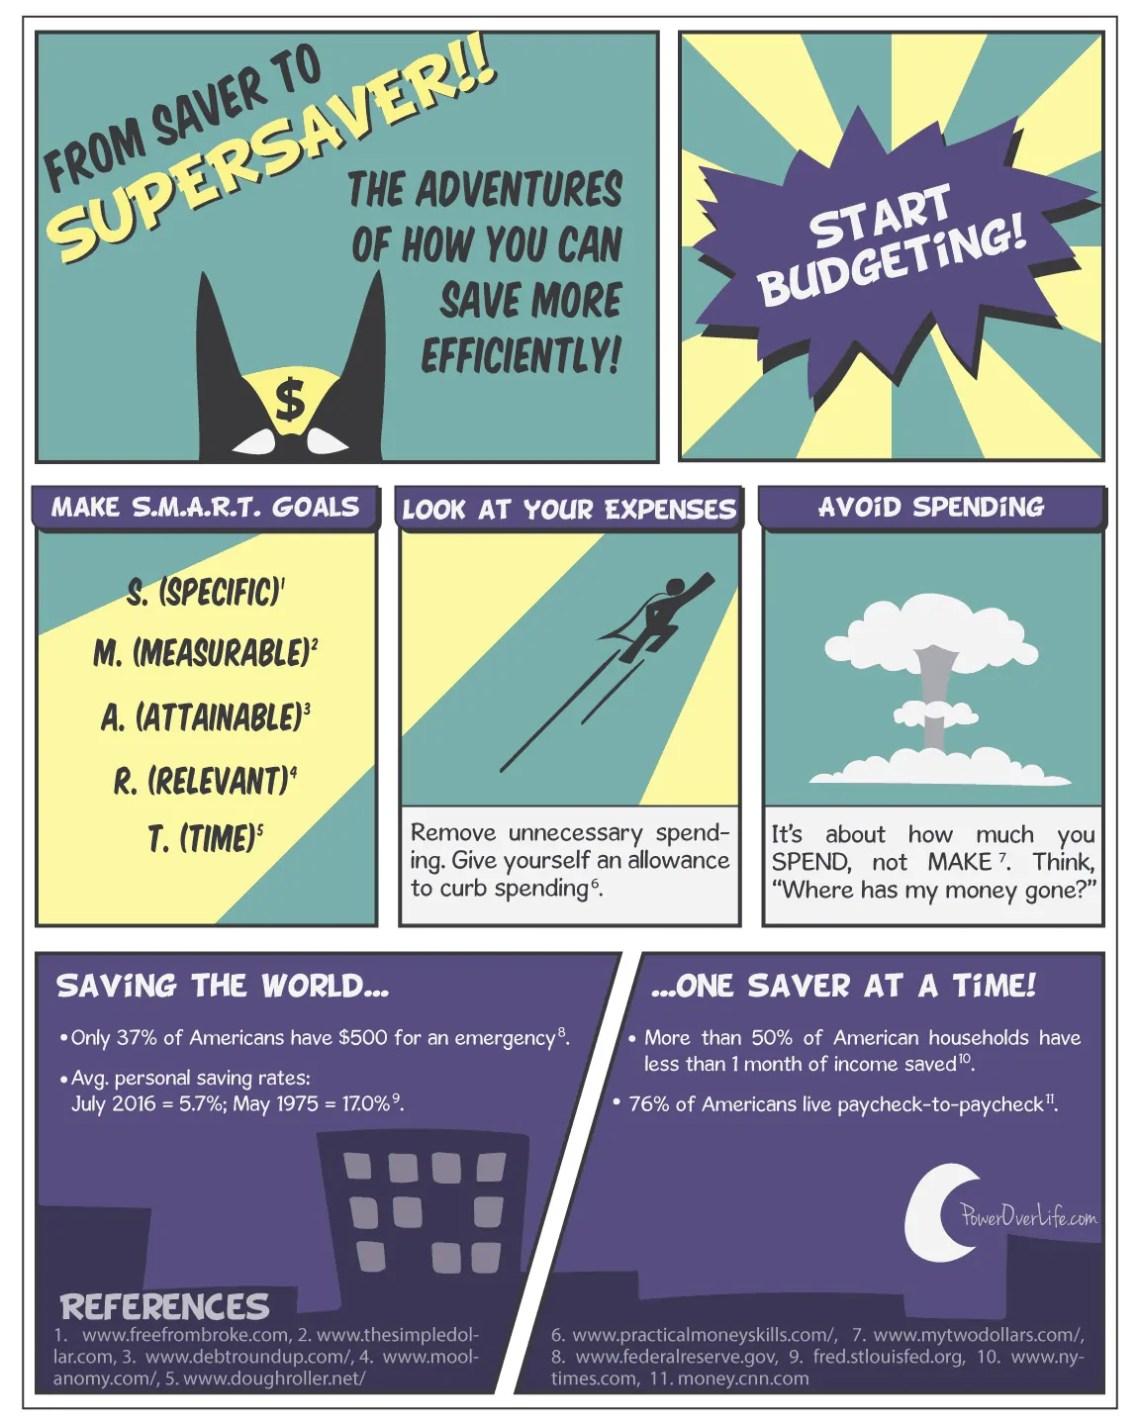 How To Become a Super Saver